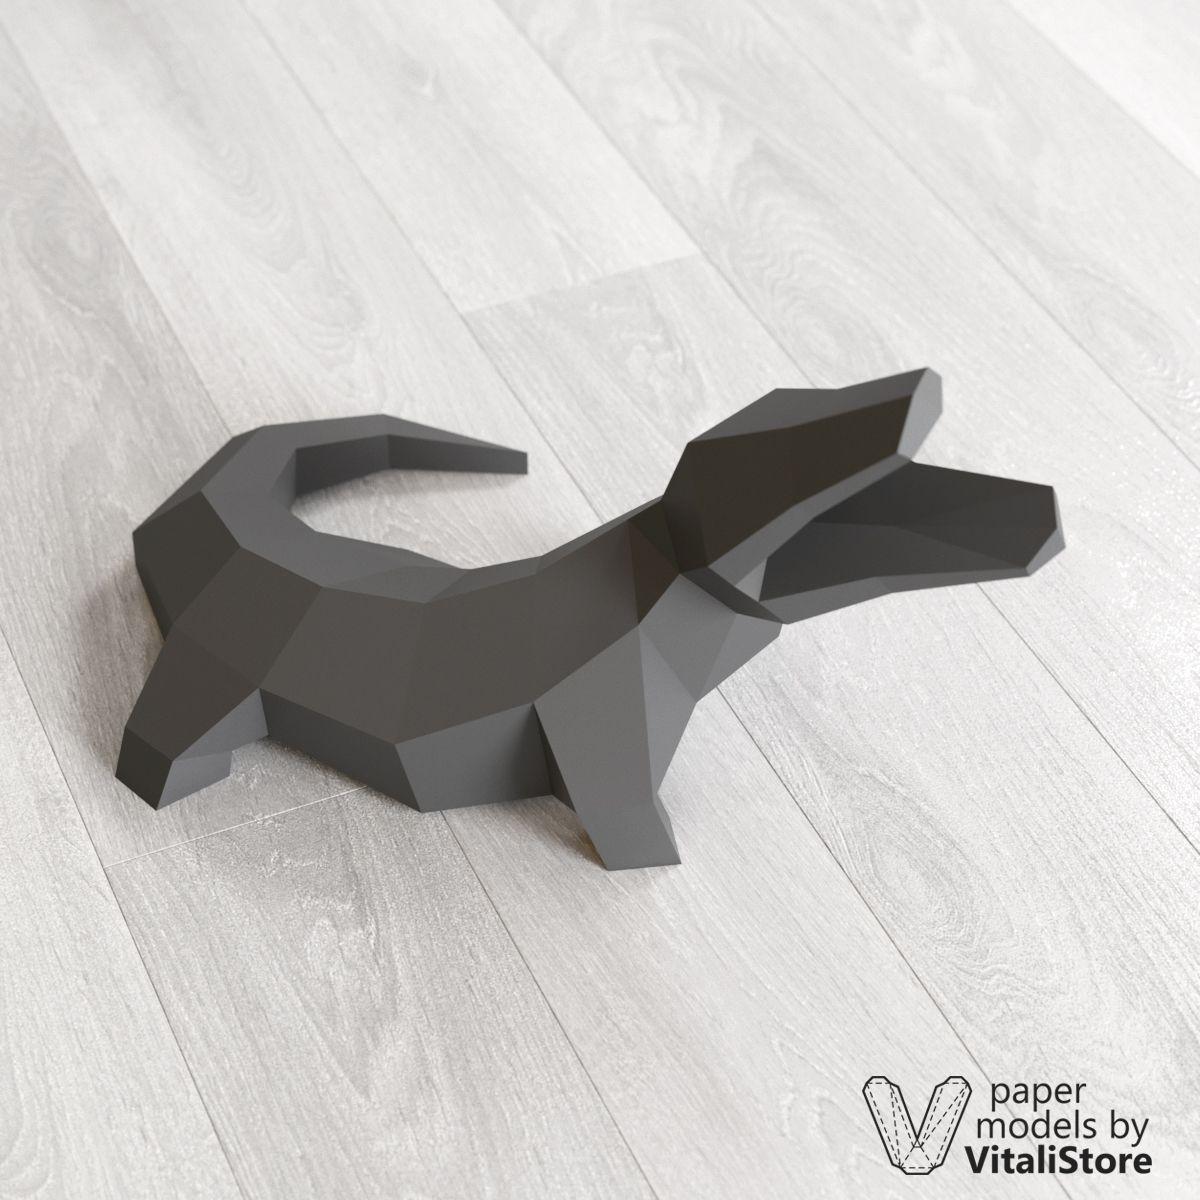 Crocodile Papercraft, Paper Sculpture, DIY Gift | 3D